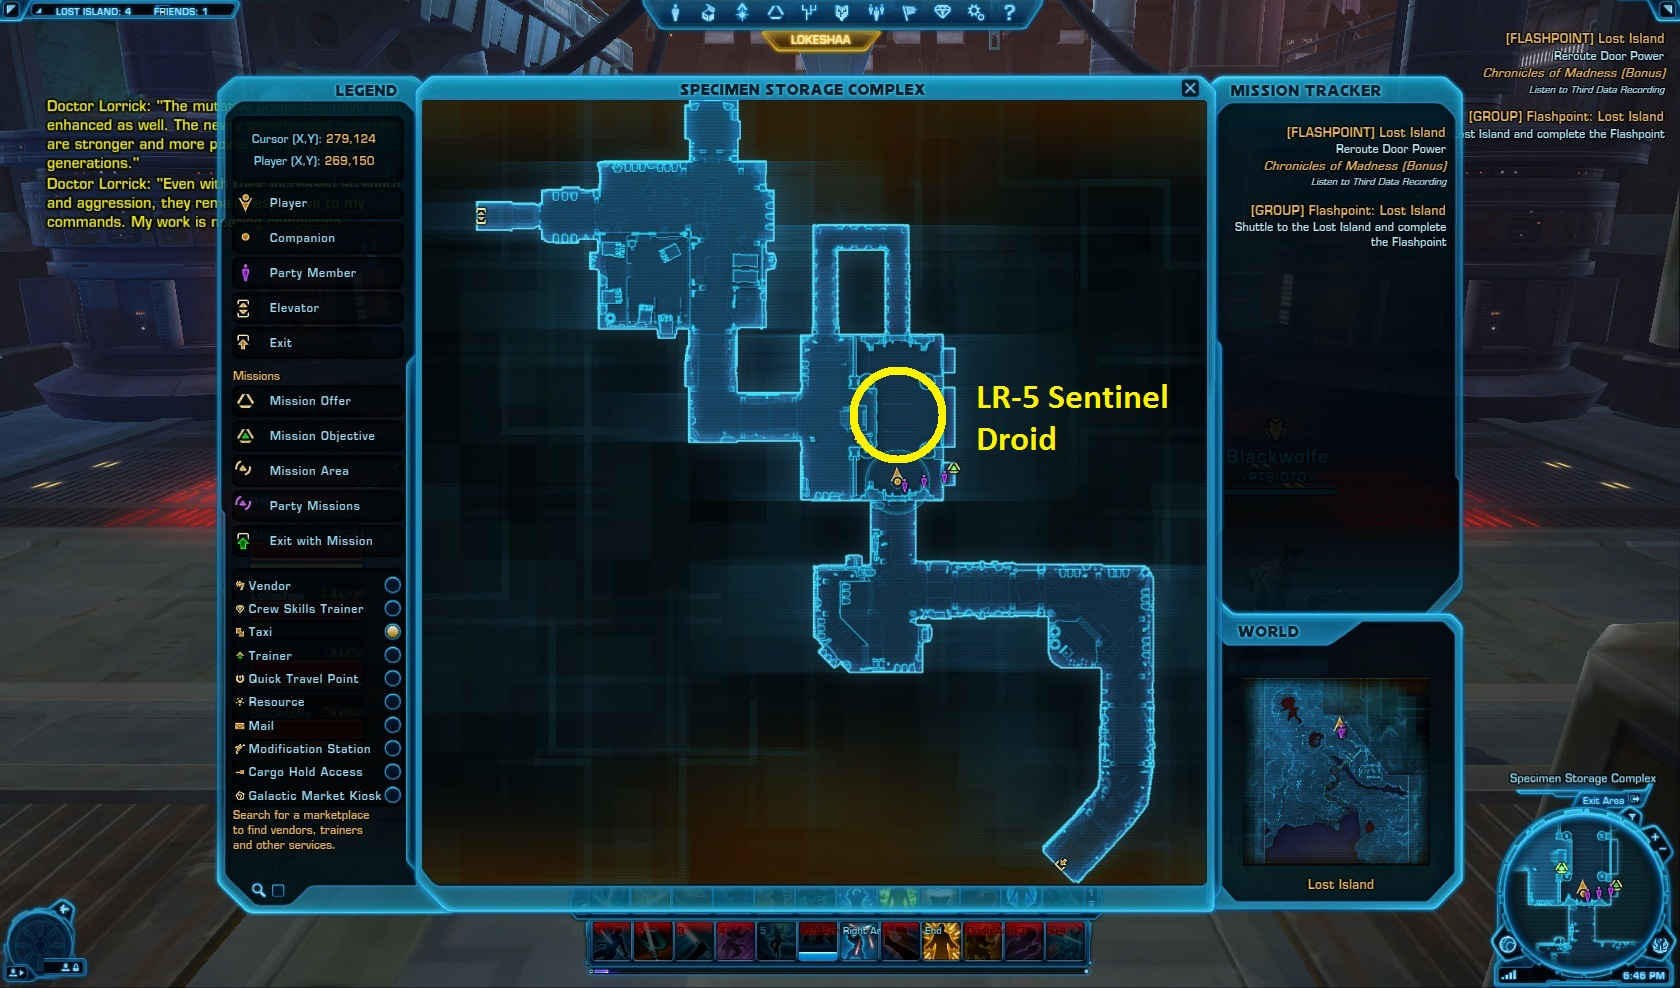 LR-5 Sentinel Droid Location